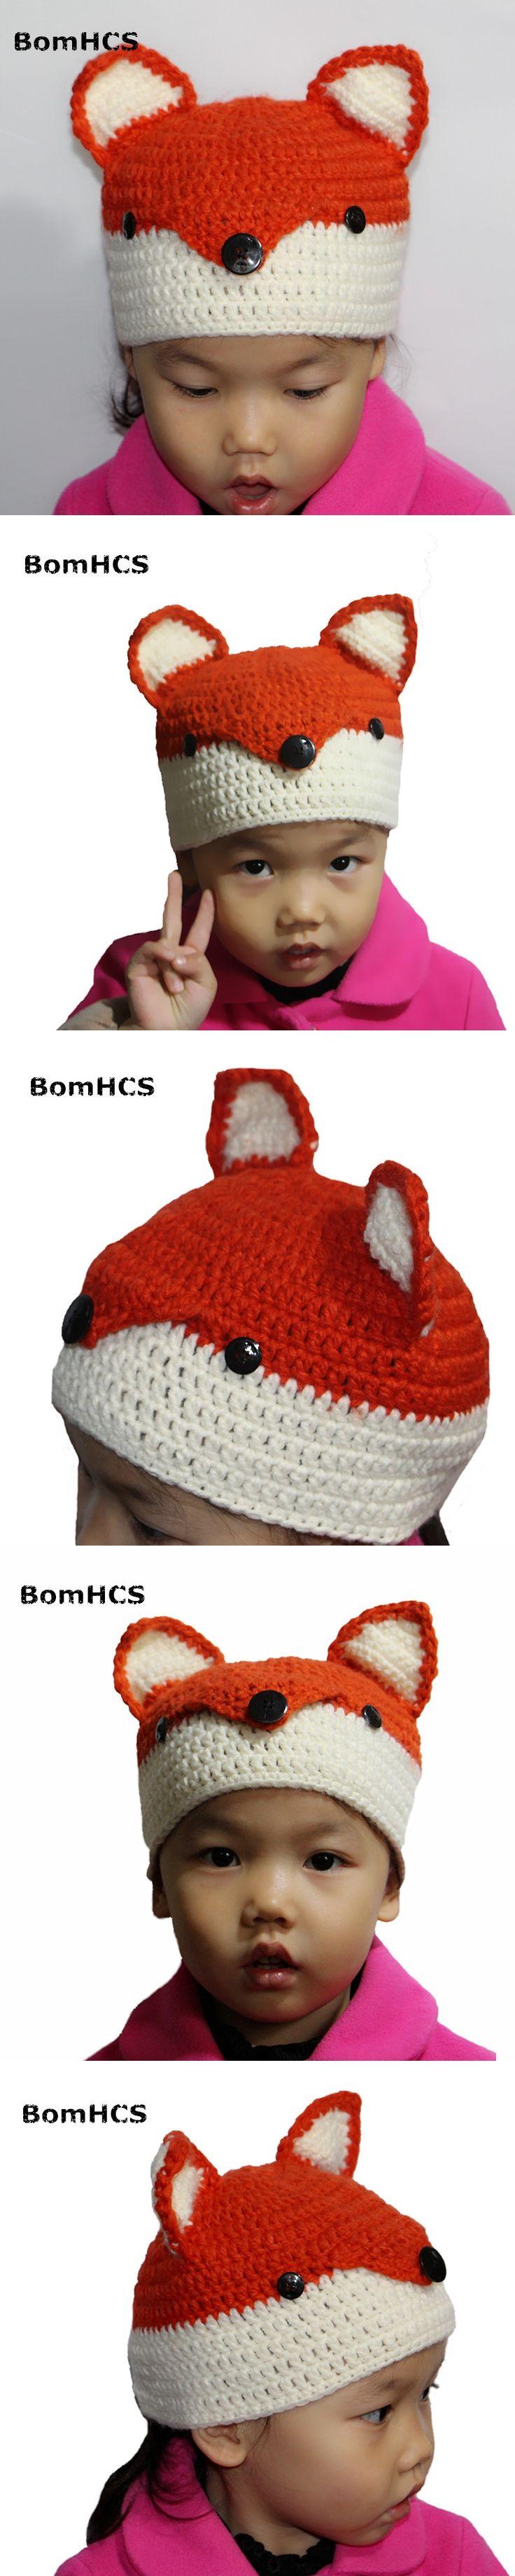 BomHCS Cute Fox Ears Hat 100% Handmade Knitted Kids Ears Cap Winter Warm Beanie